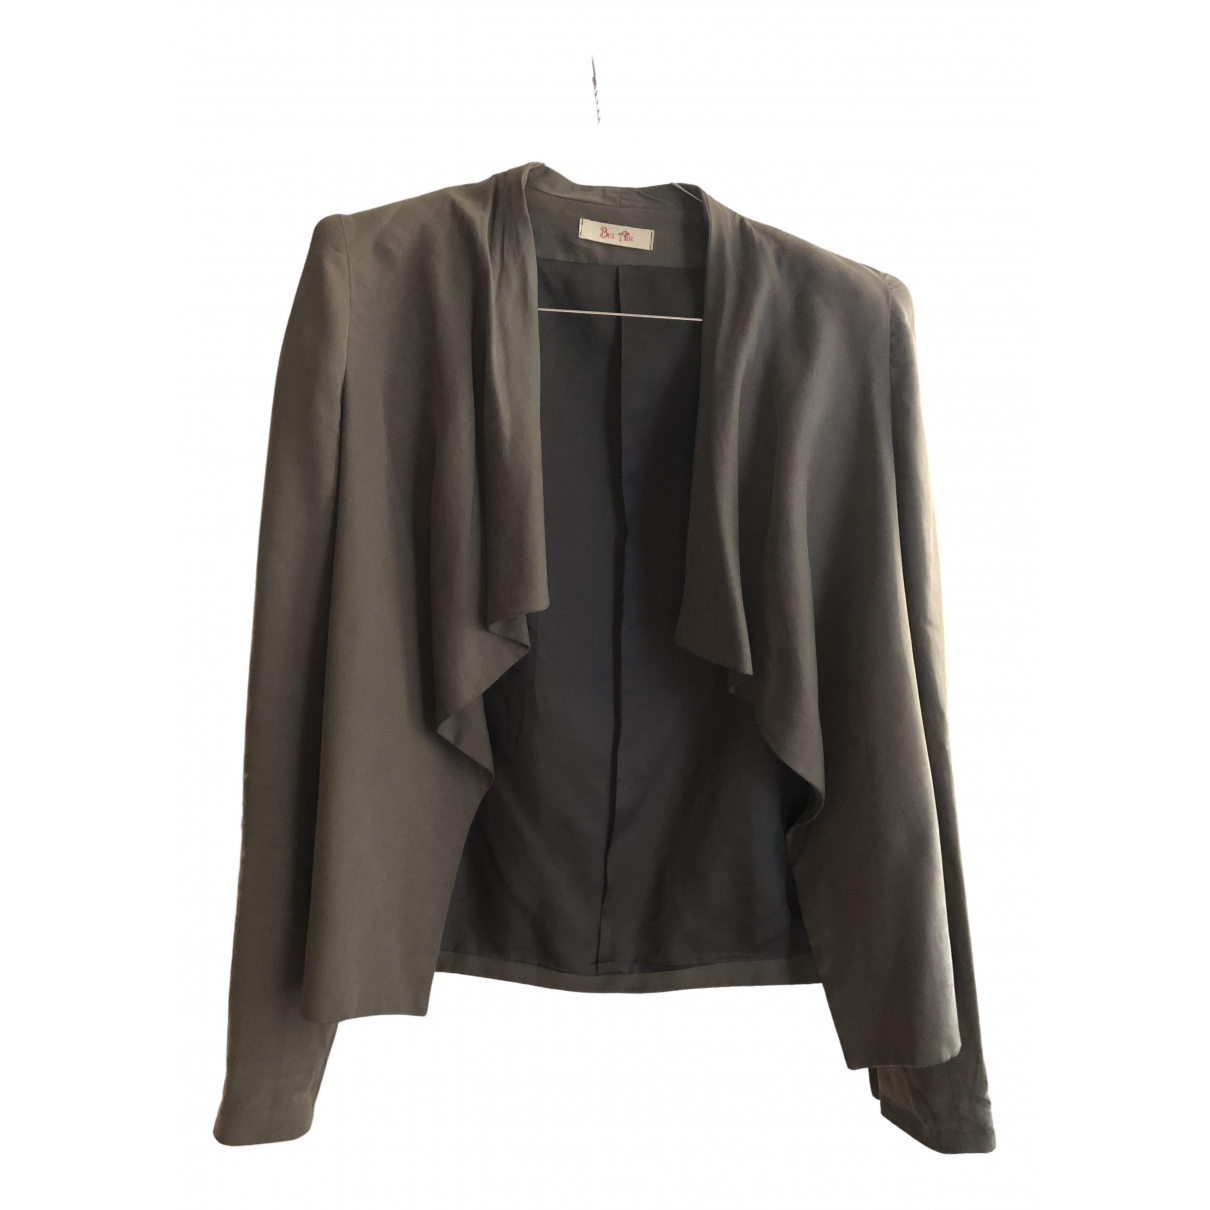 Bel Air \N Green jacket for Women S International